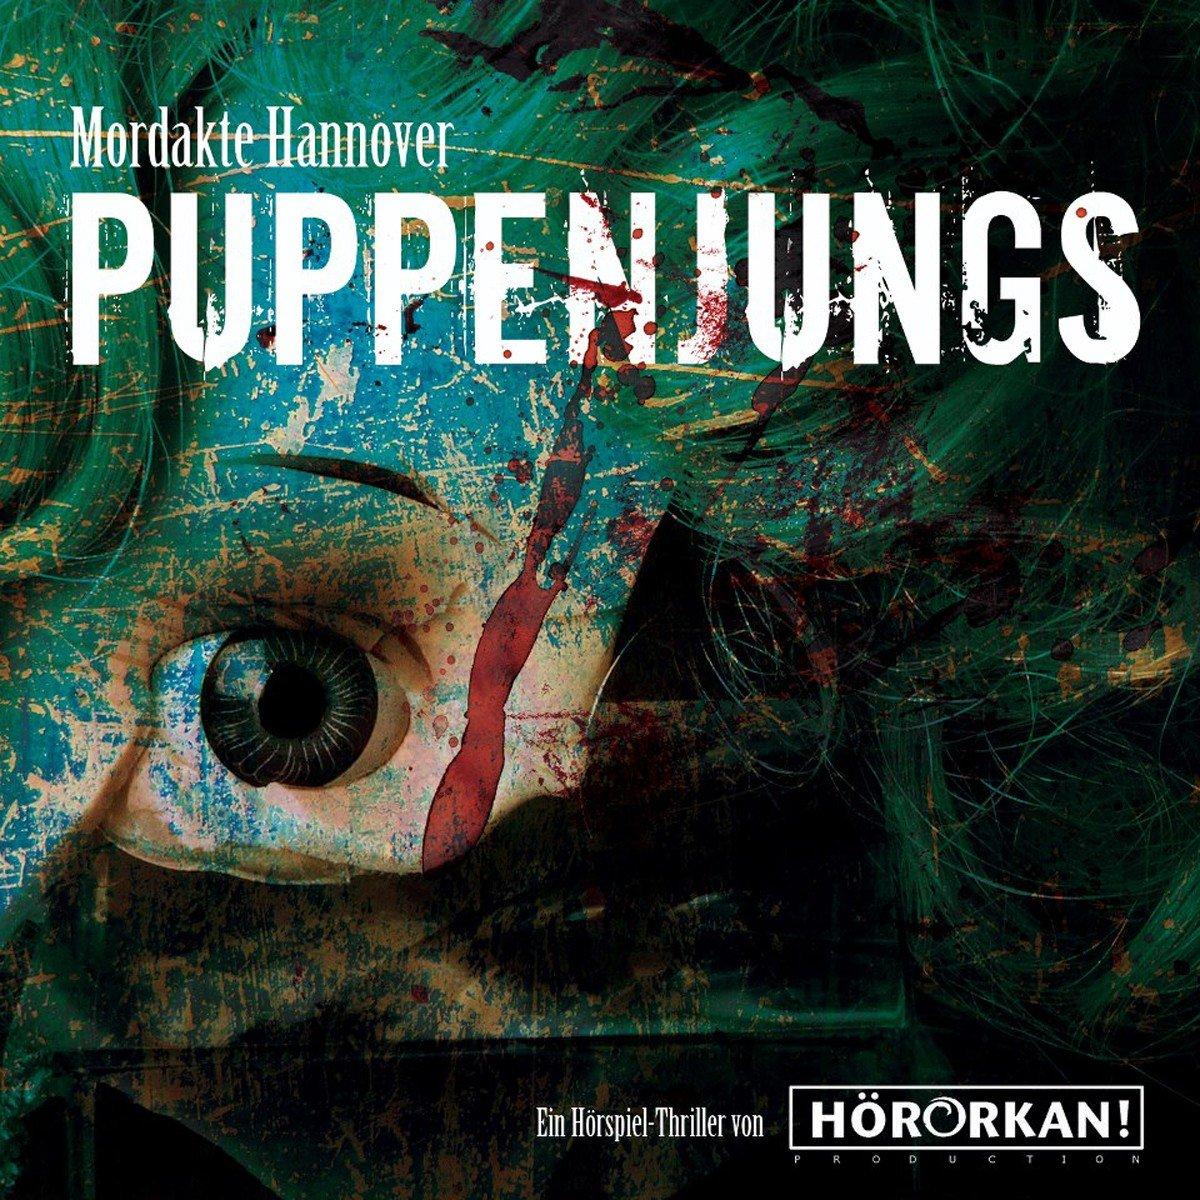 Mordakte Hannover (1) Puppenjungs (Hörorkan)